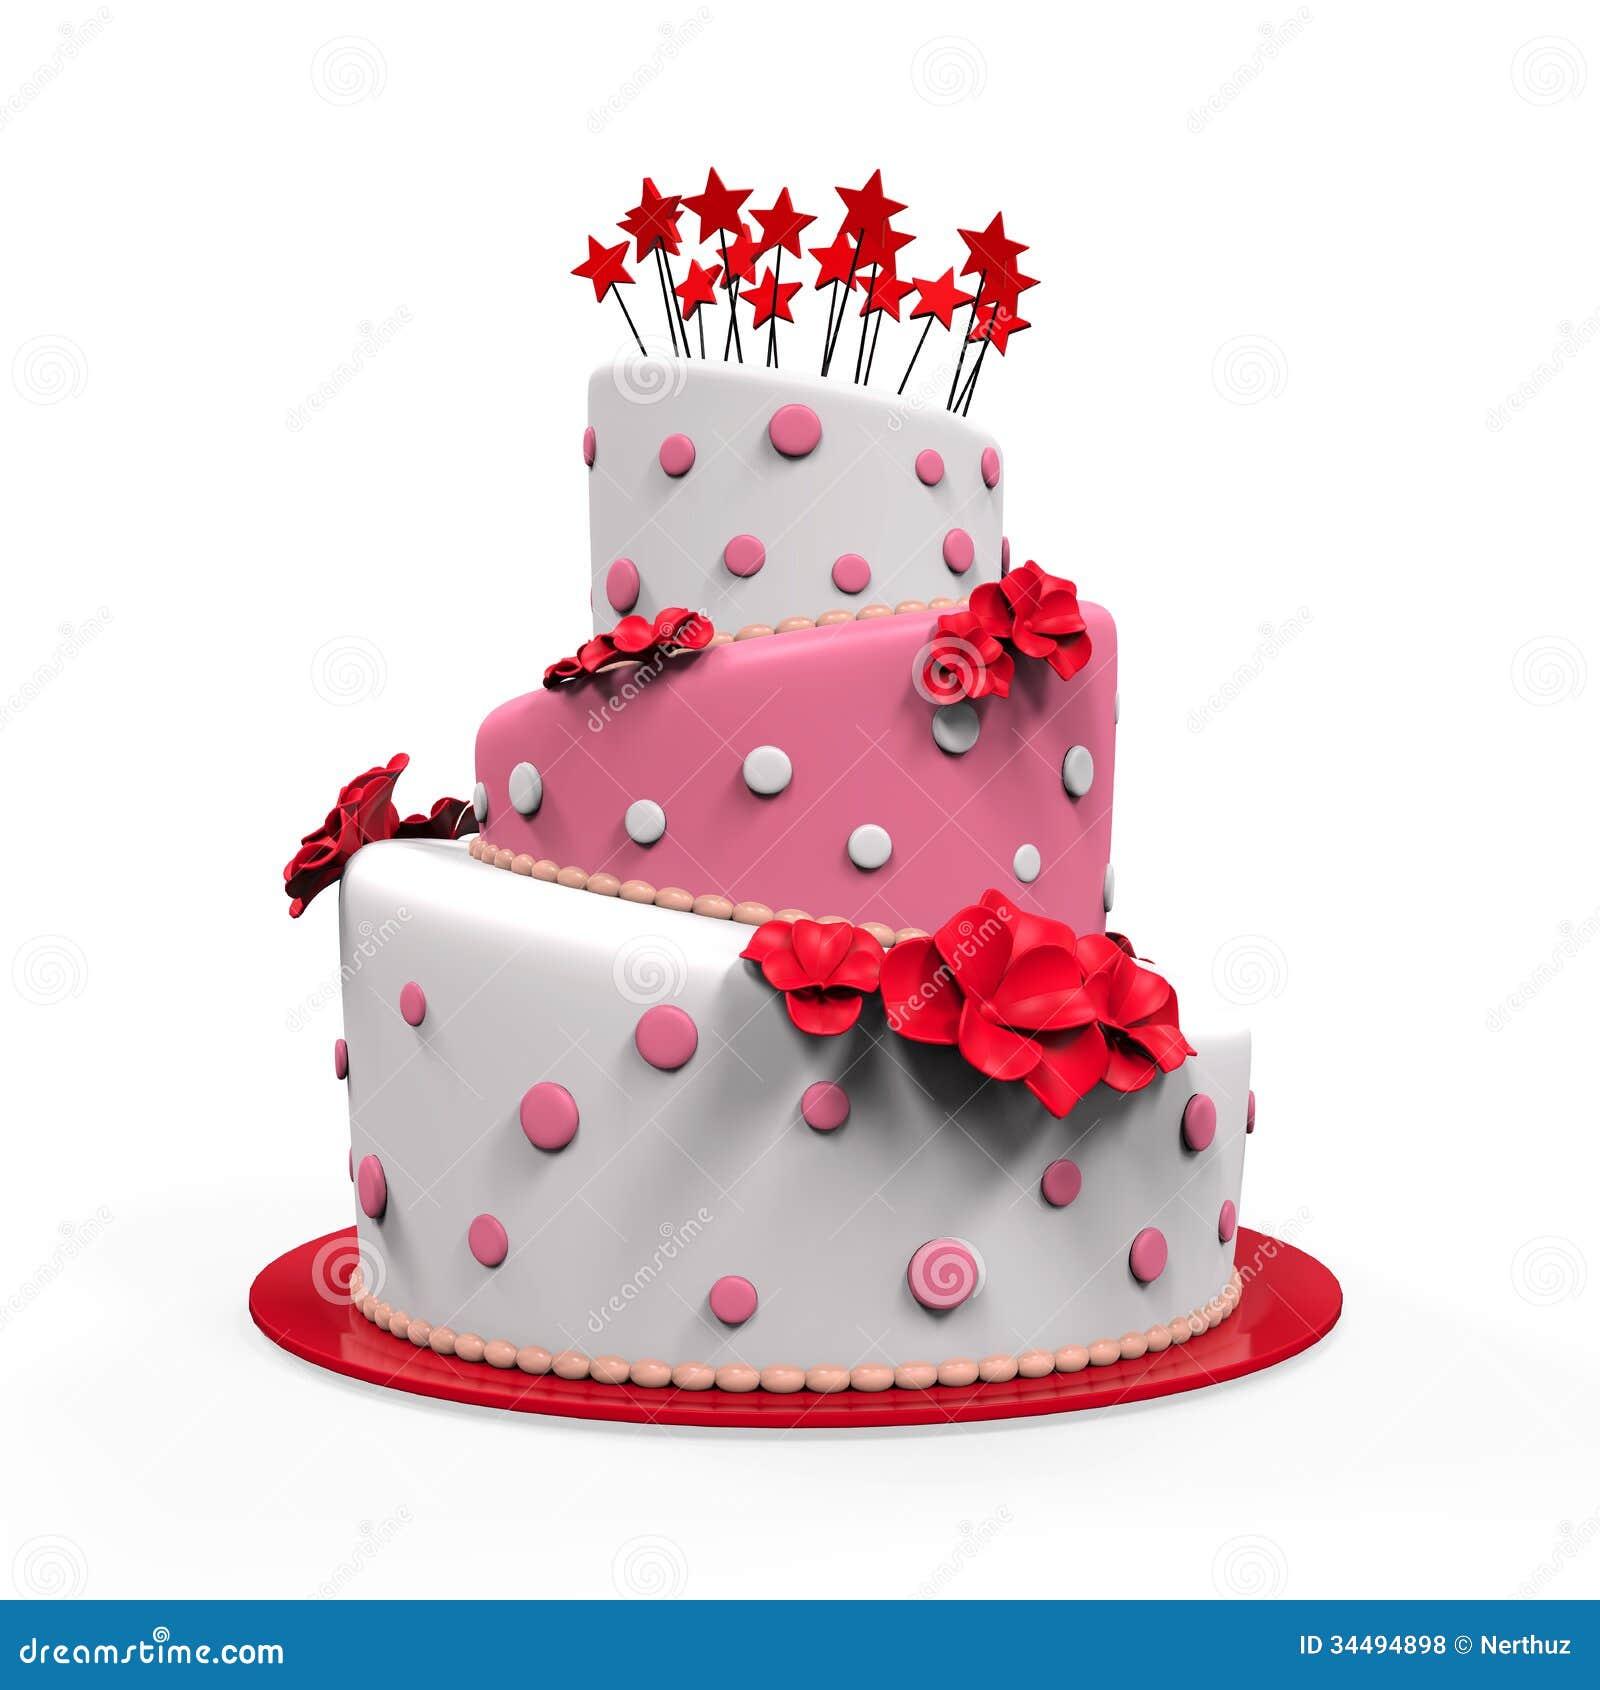 Big Cake Images Download : Big Cake Isolated Royalty Free Stock Photos - Image: 34494898